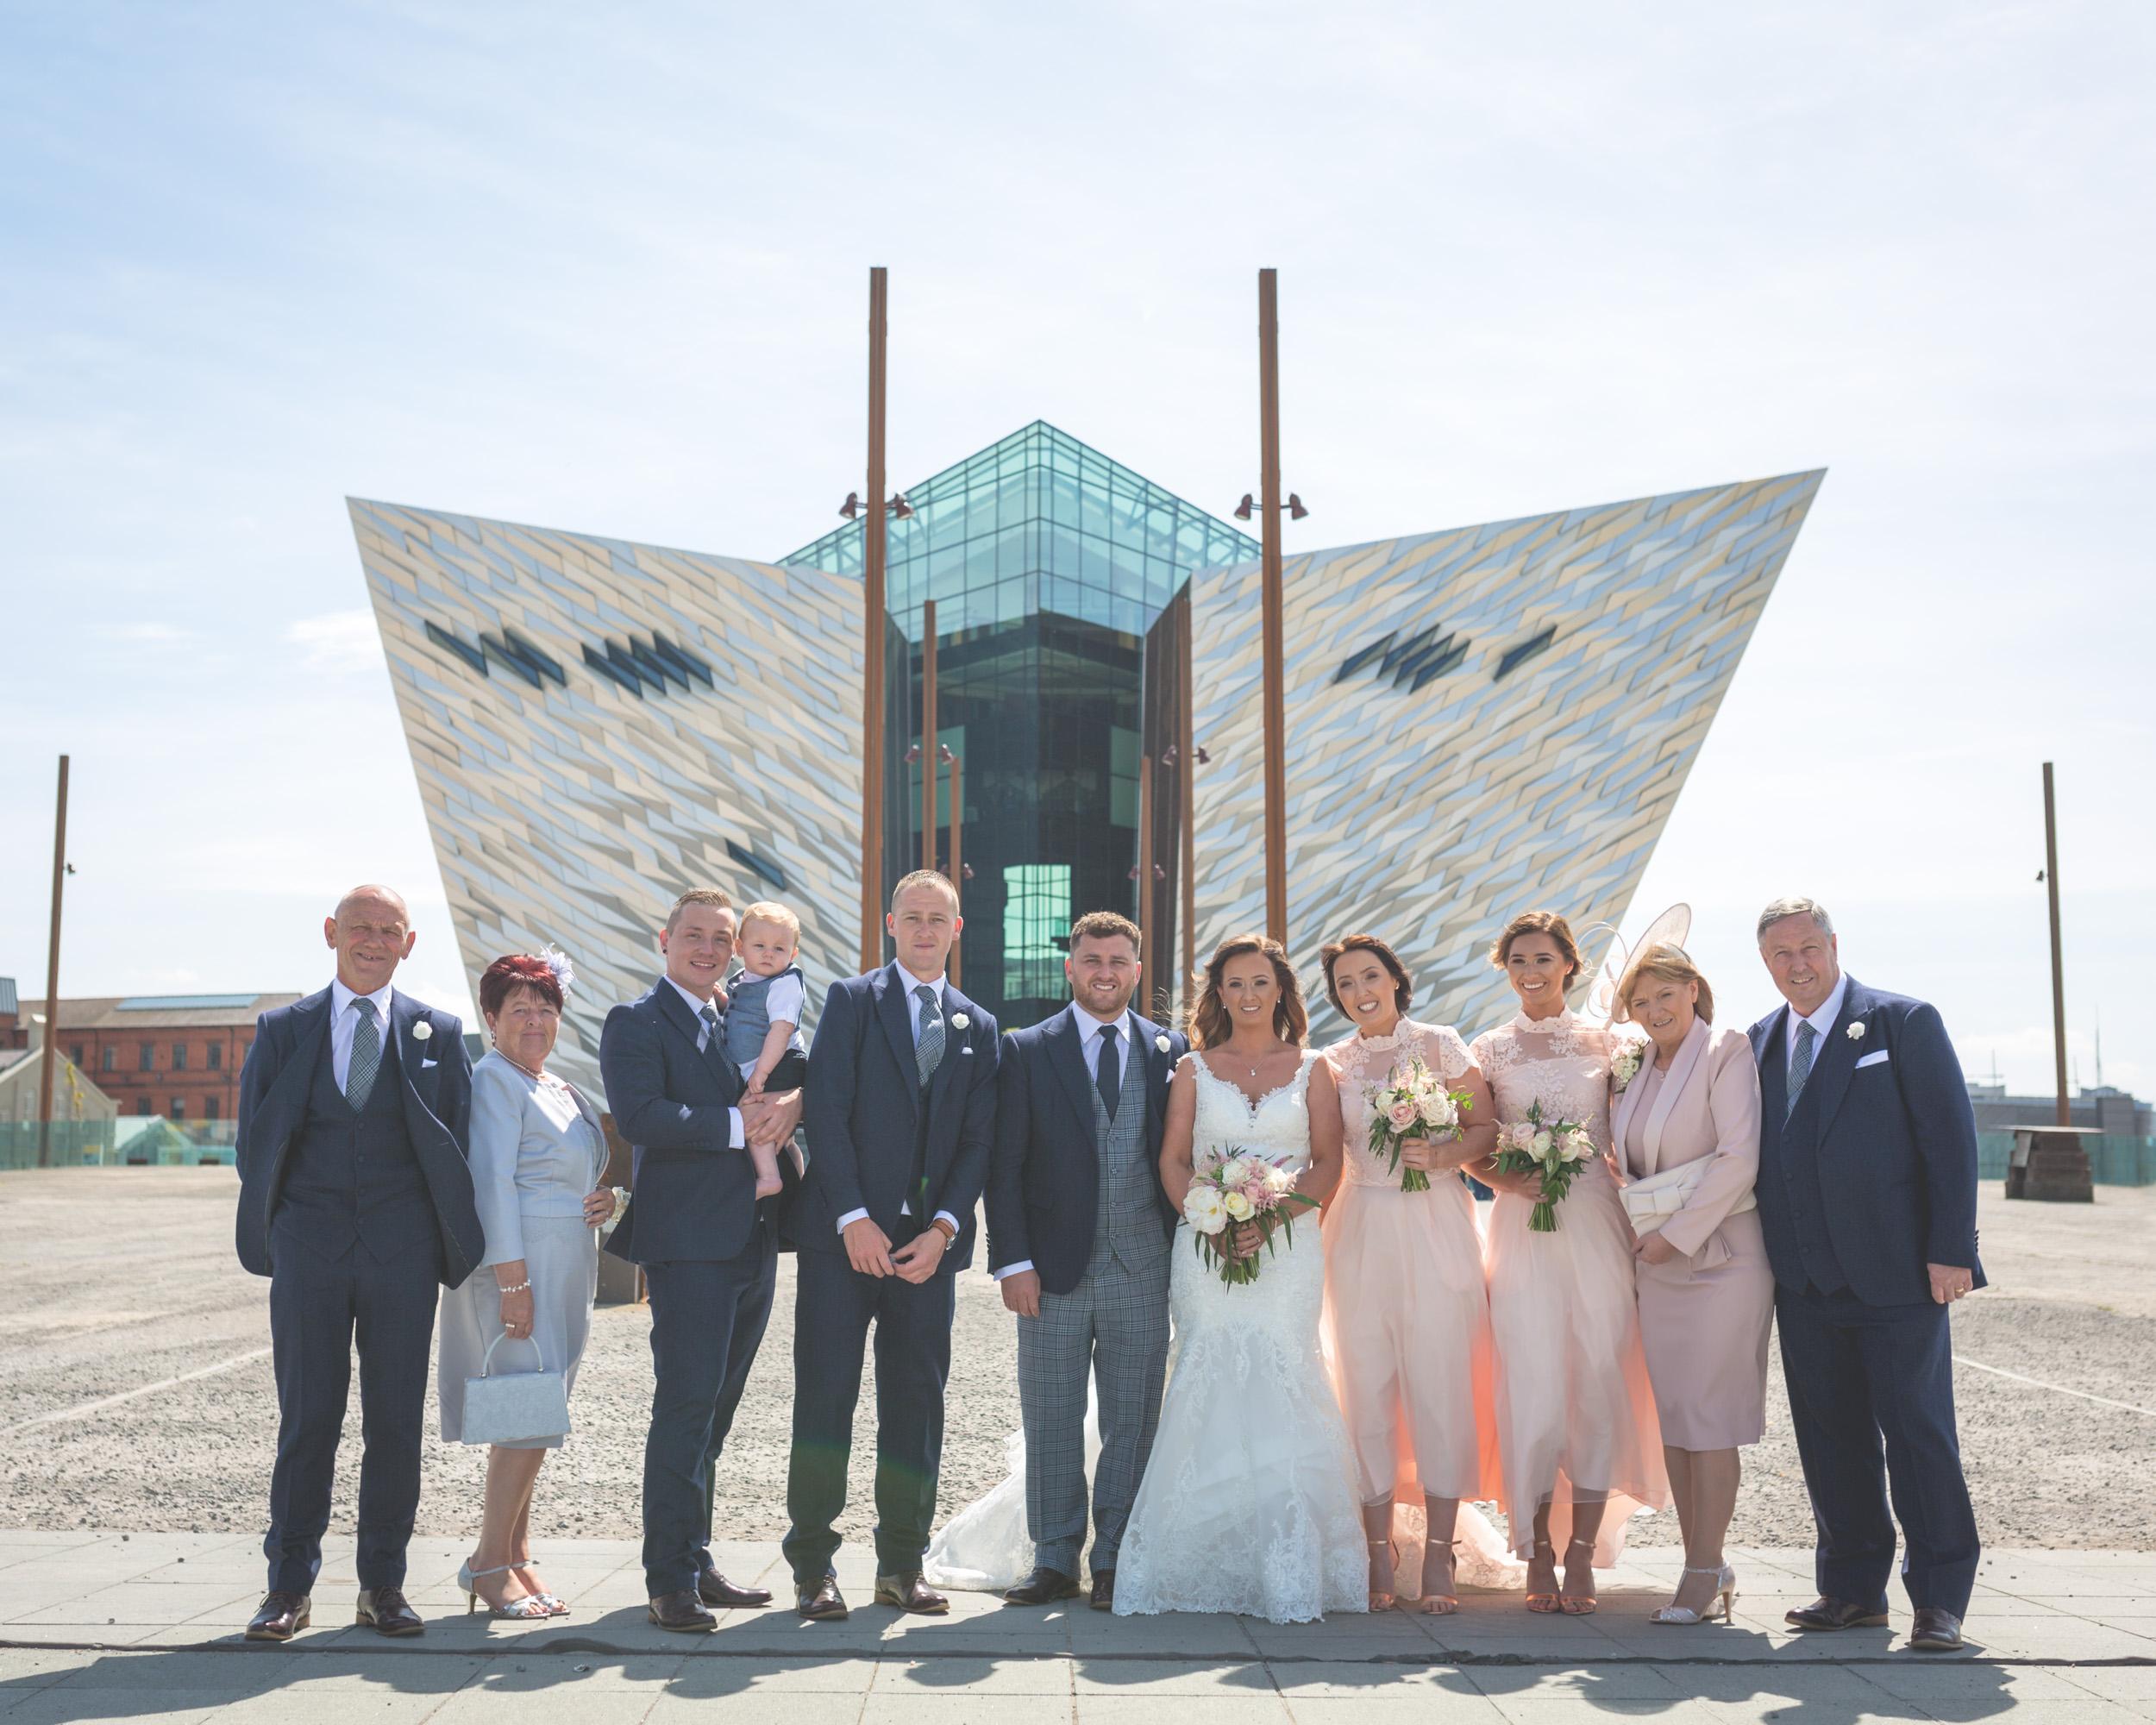 Brian McEwan   Northern Ireland Wedding Photographer   Rebecca & Michael   Portraits-24.jpg